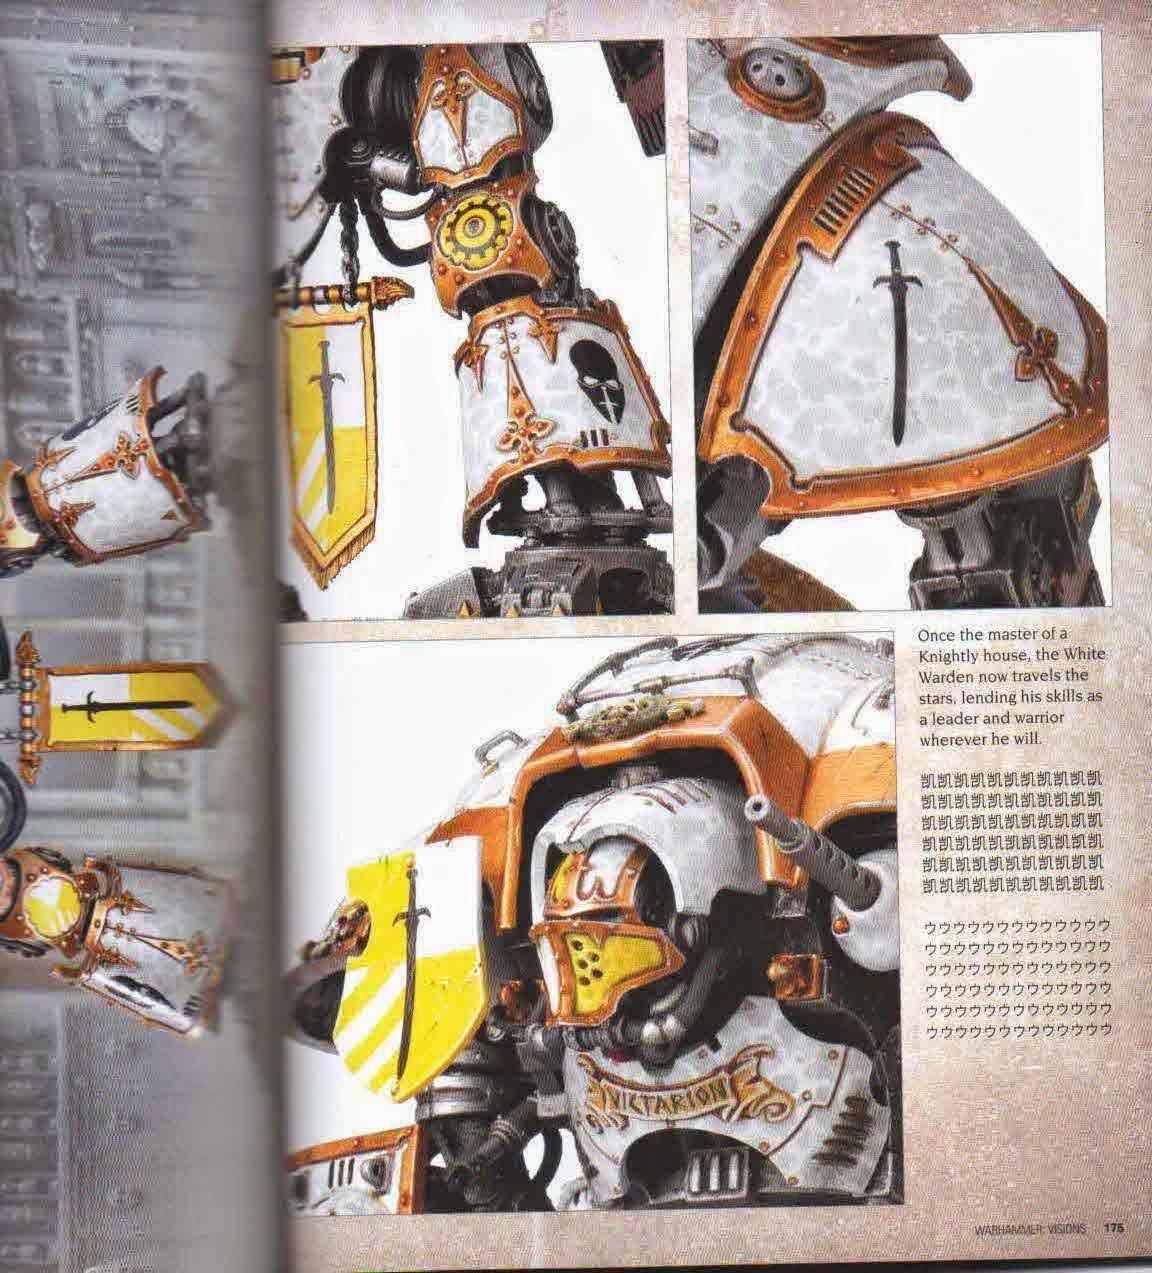 Errores Warhammer: Visions, número 3, página 175